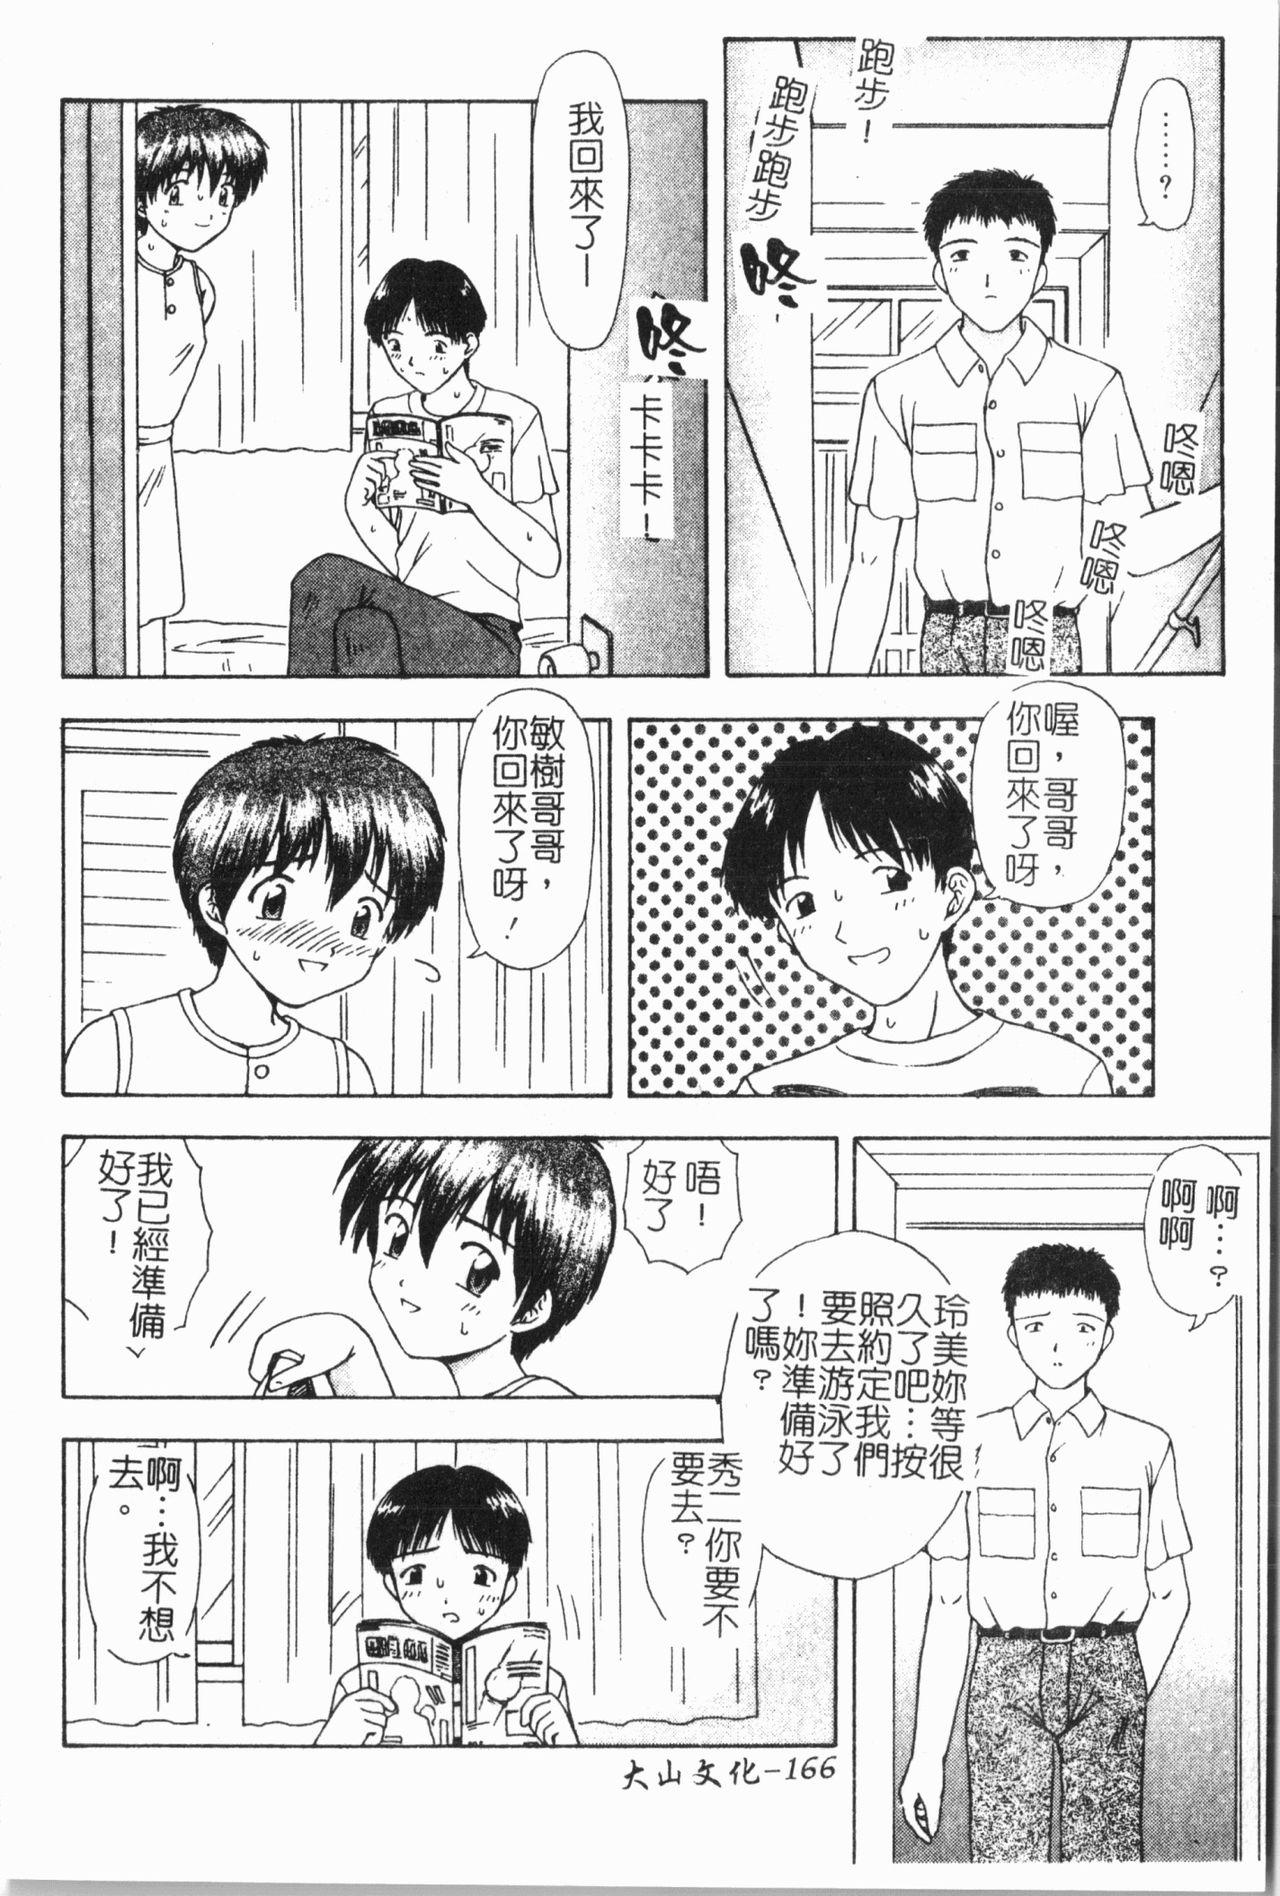 Imouto Koishi 6 168